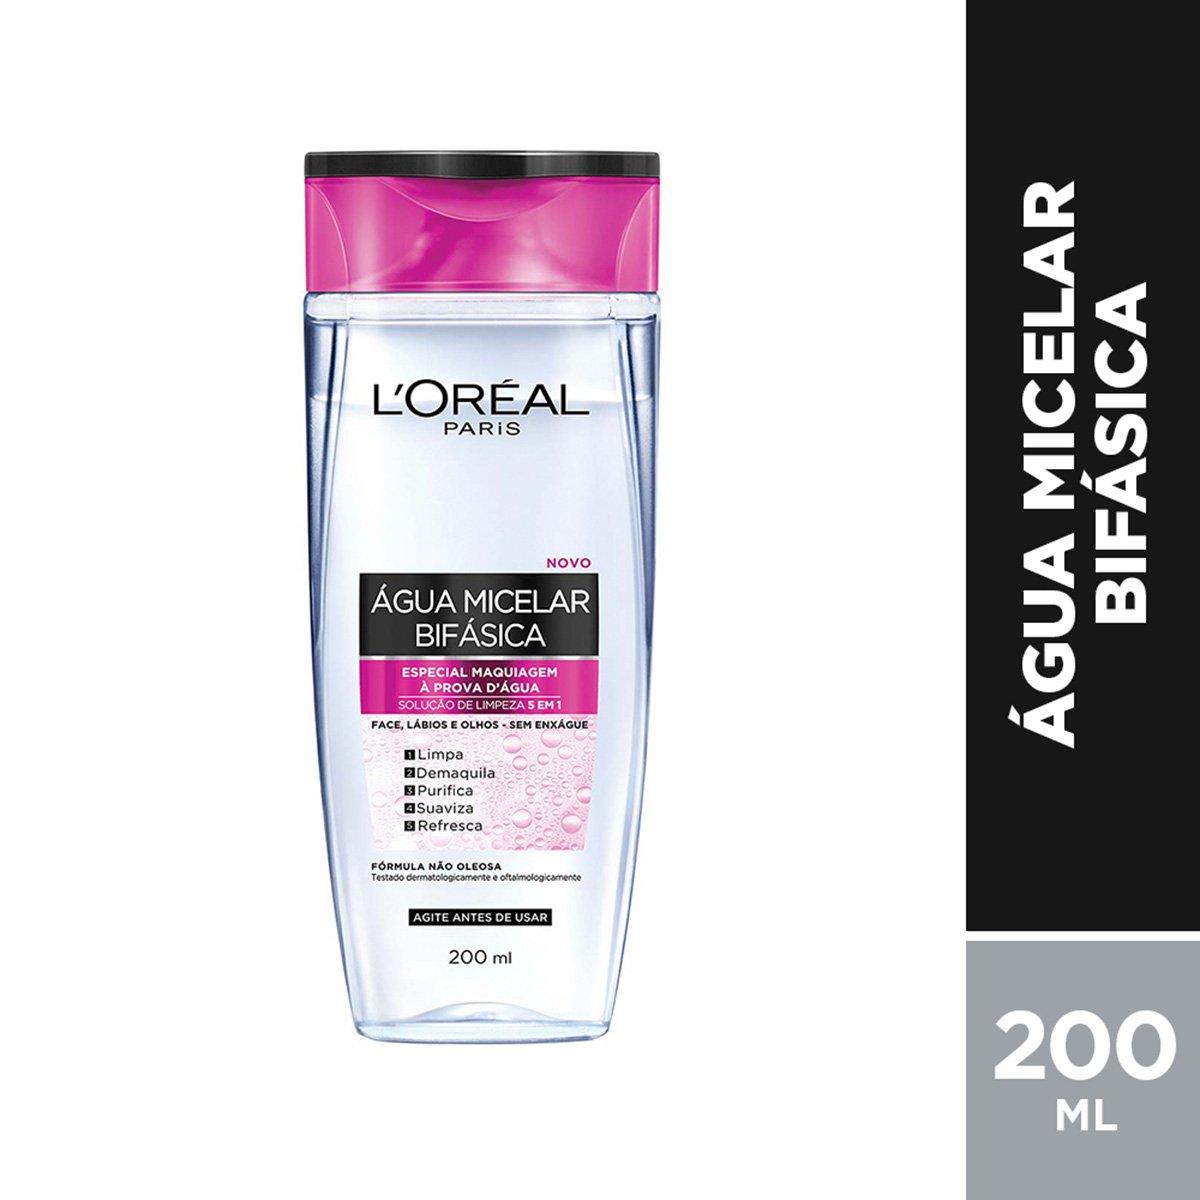 Água Micelar L'Oréal Paris Bifásica, 200ml